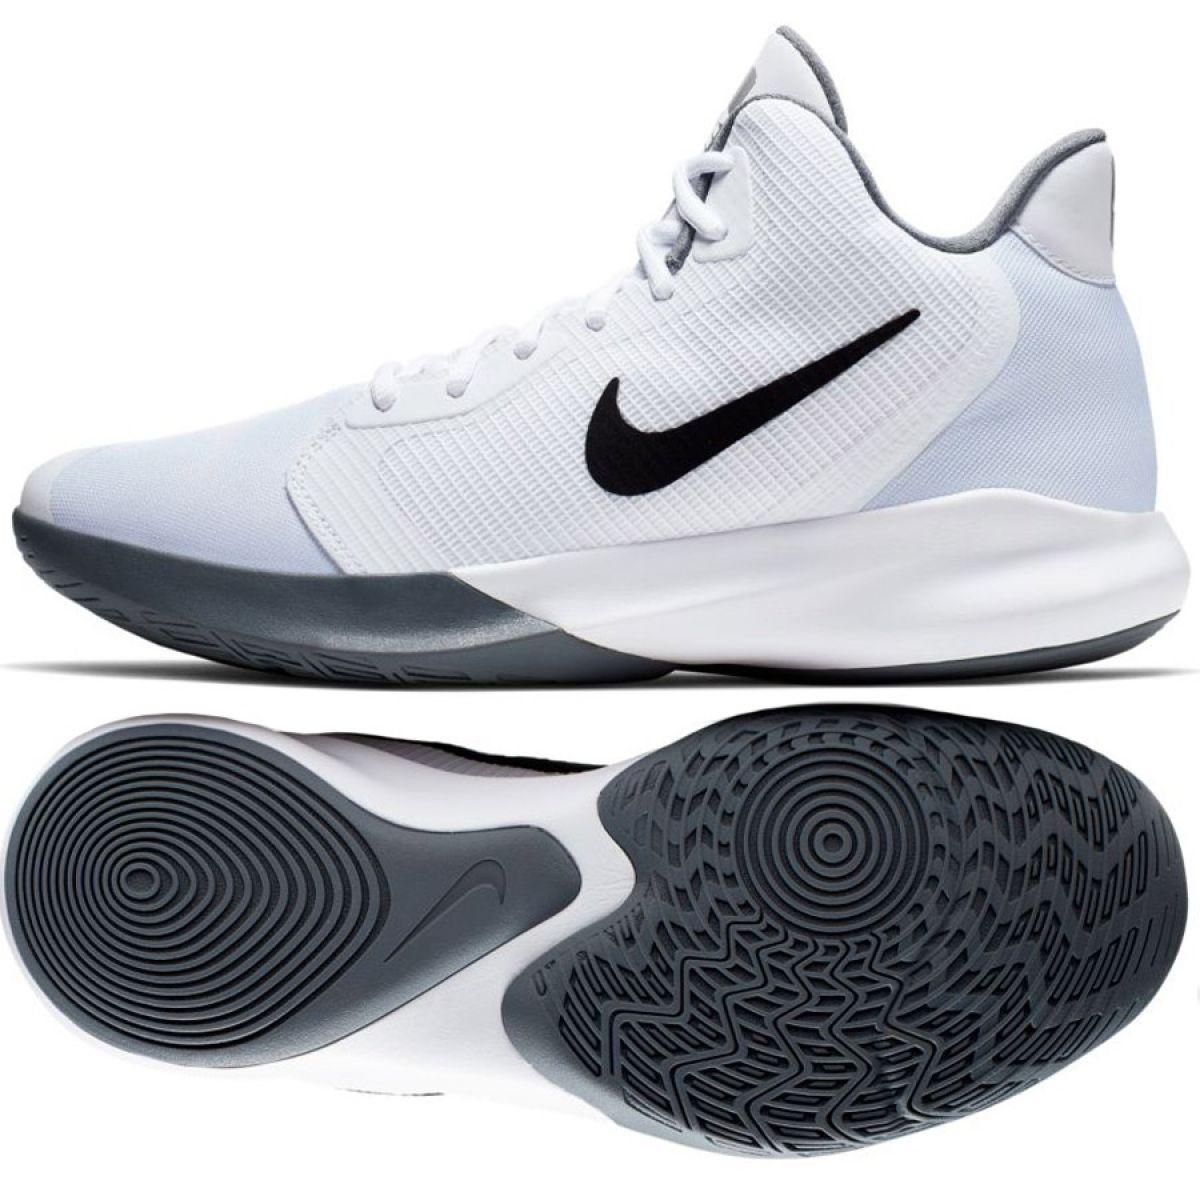 Buty Nike Precision Iii M AQ7495 100 białe biały